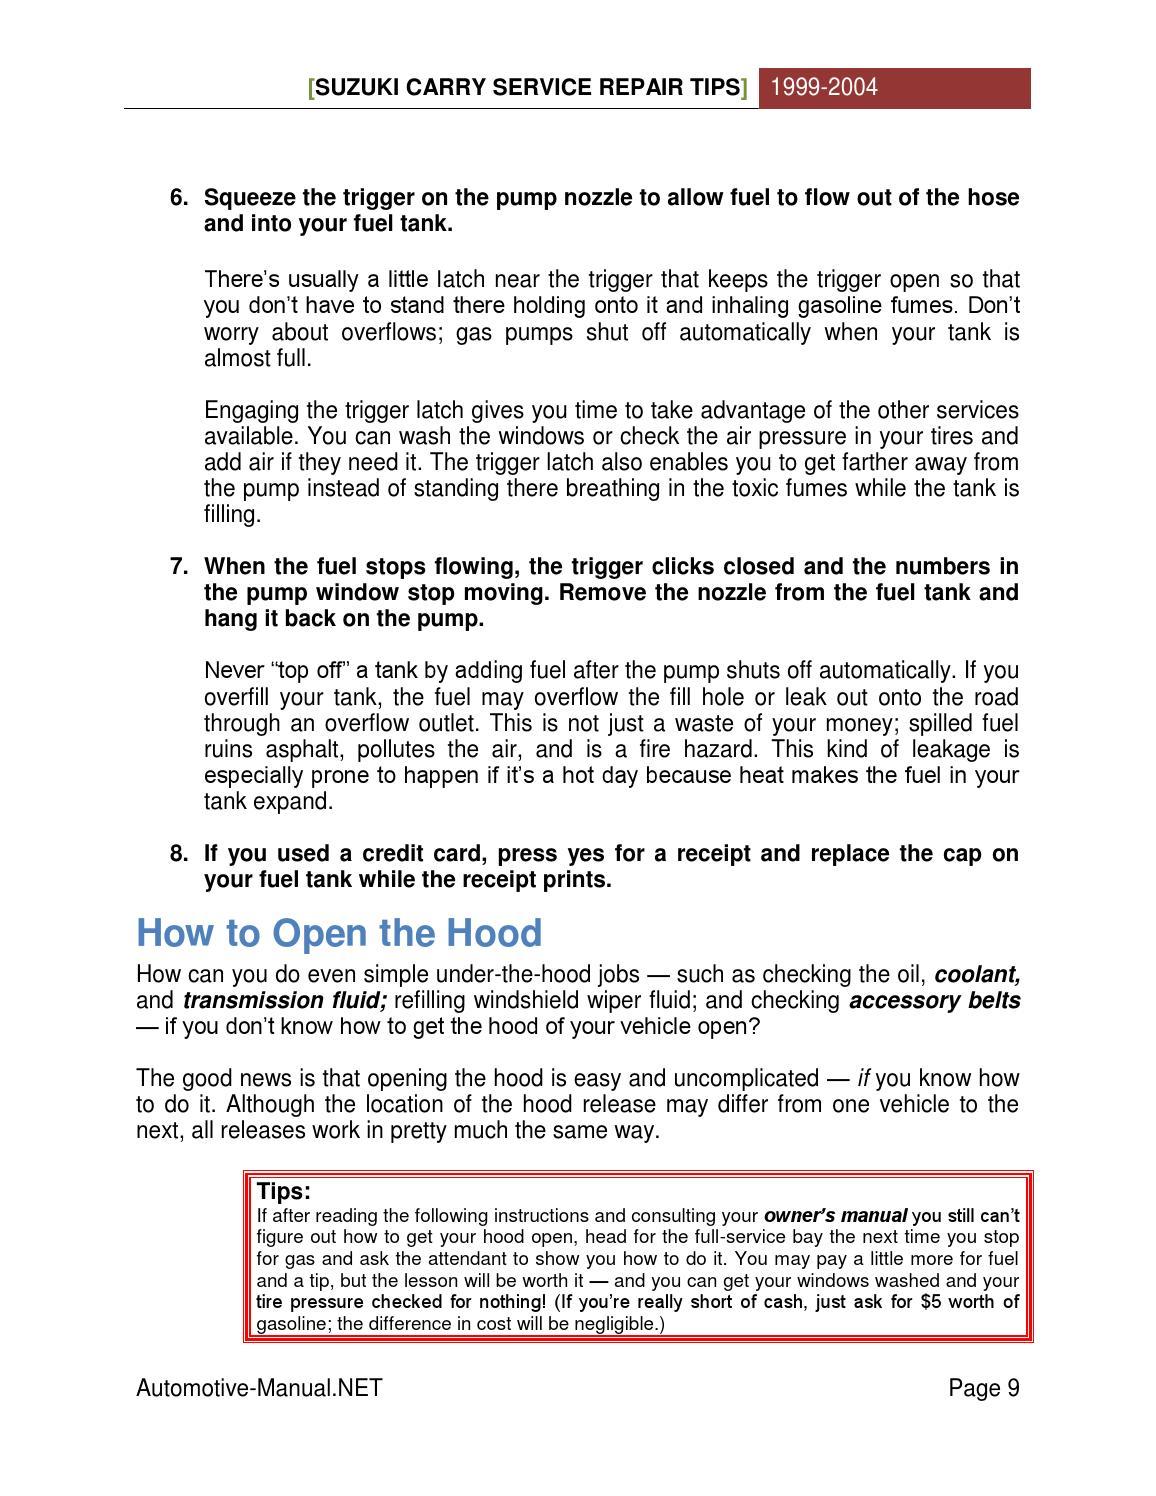 Suzuki Carry 1999-2004 Service Repair Tips by Armando Oliver